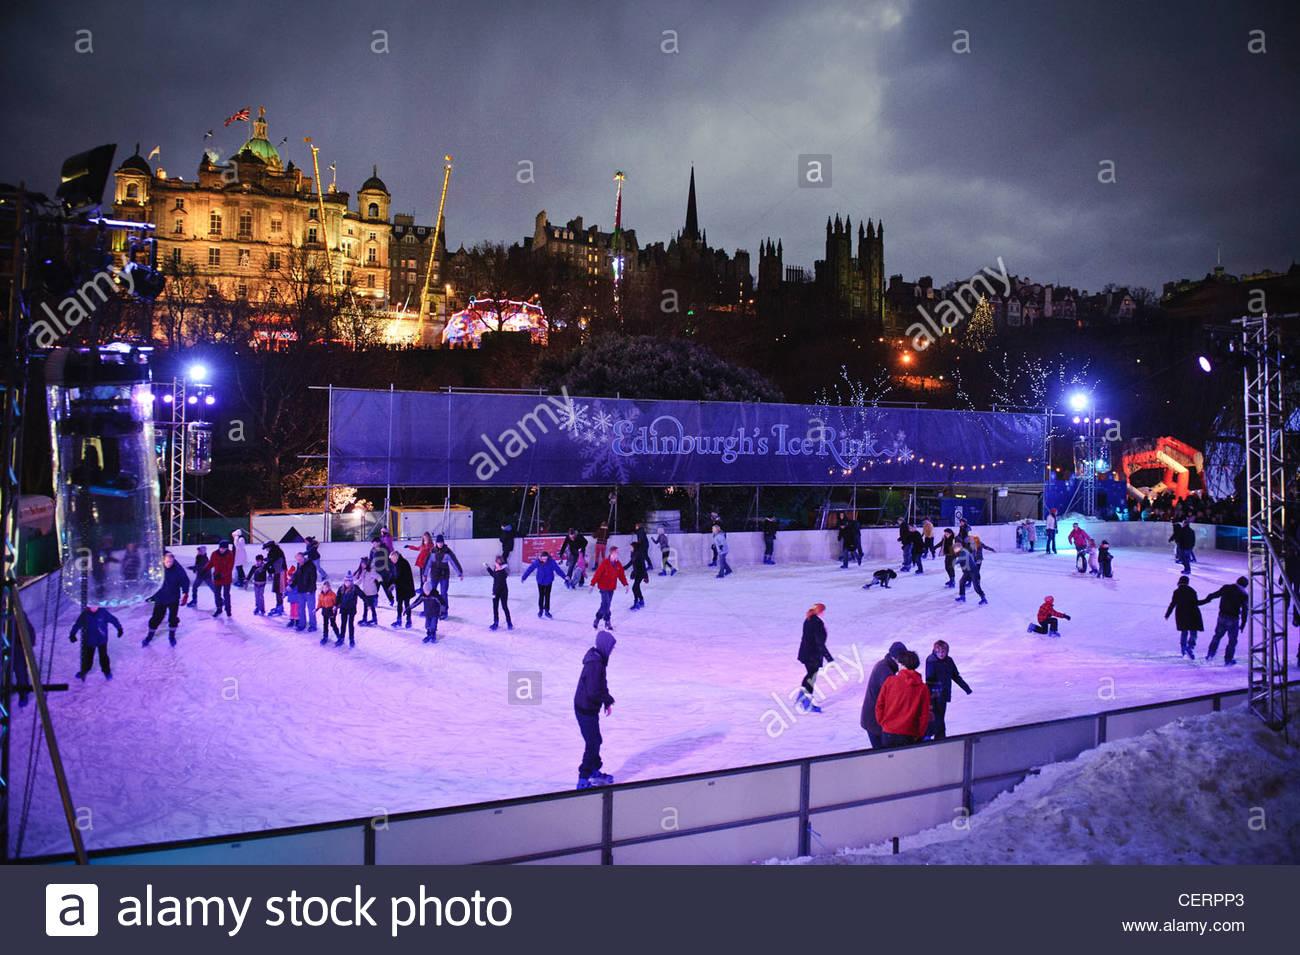 people ice skating in princes street gardens during the edinburgh